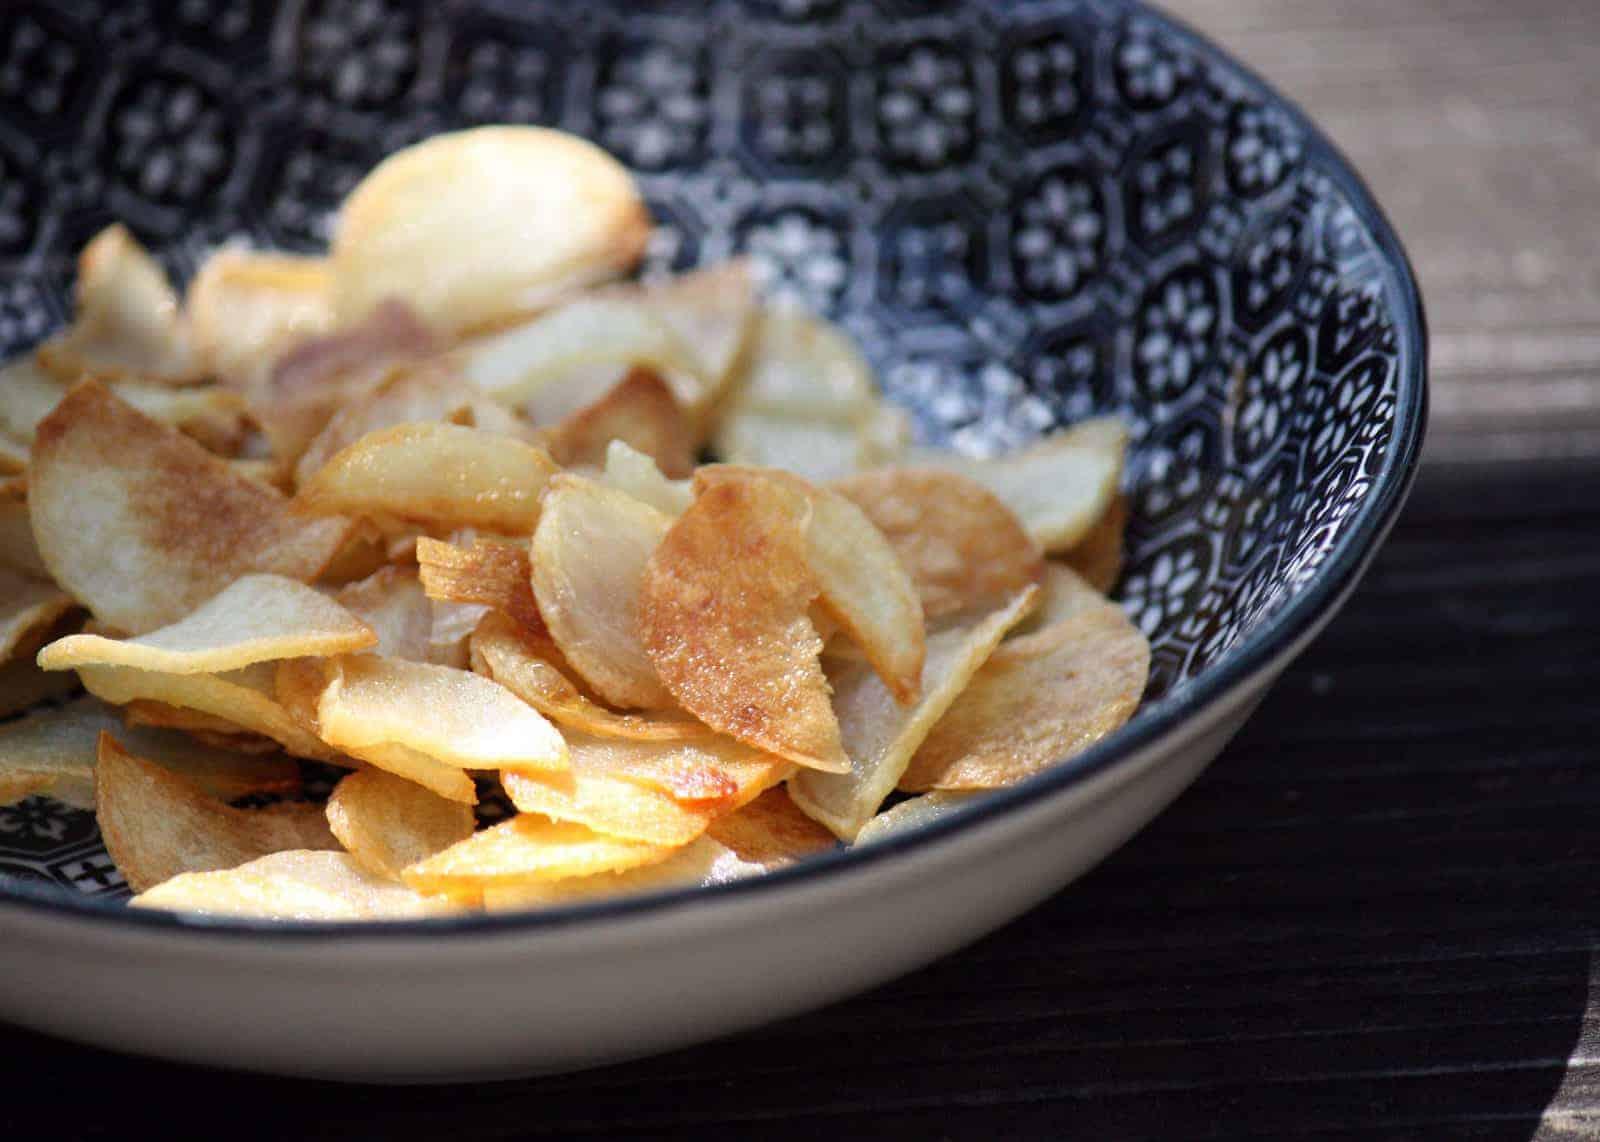 knoblauch chips raffinierte knuspriger knoblauch snack. Black Bedroom Furniture Sets. Home Design Ideas